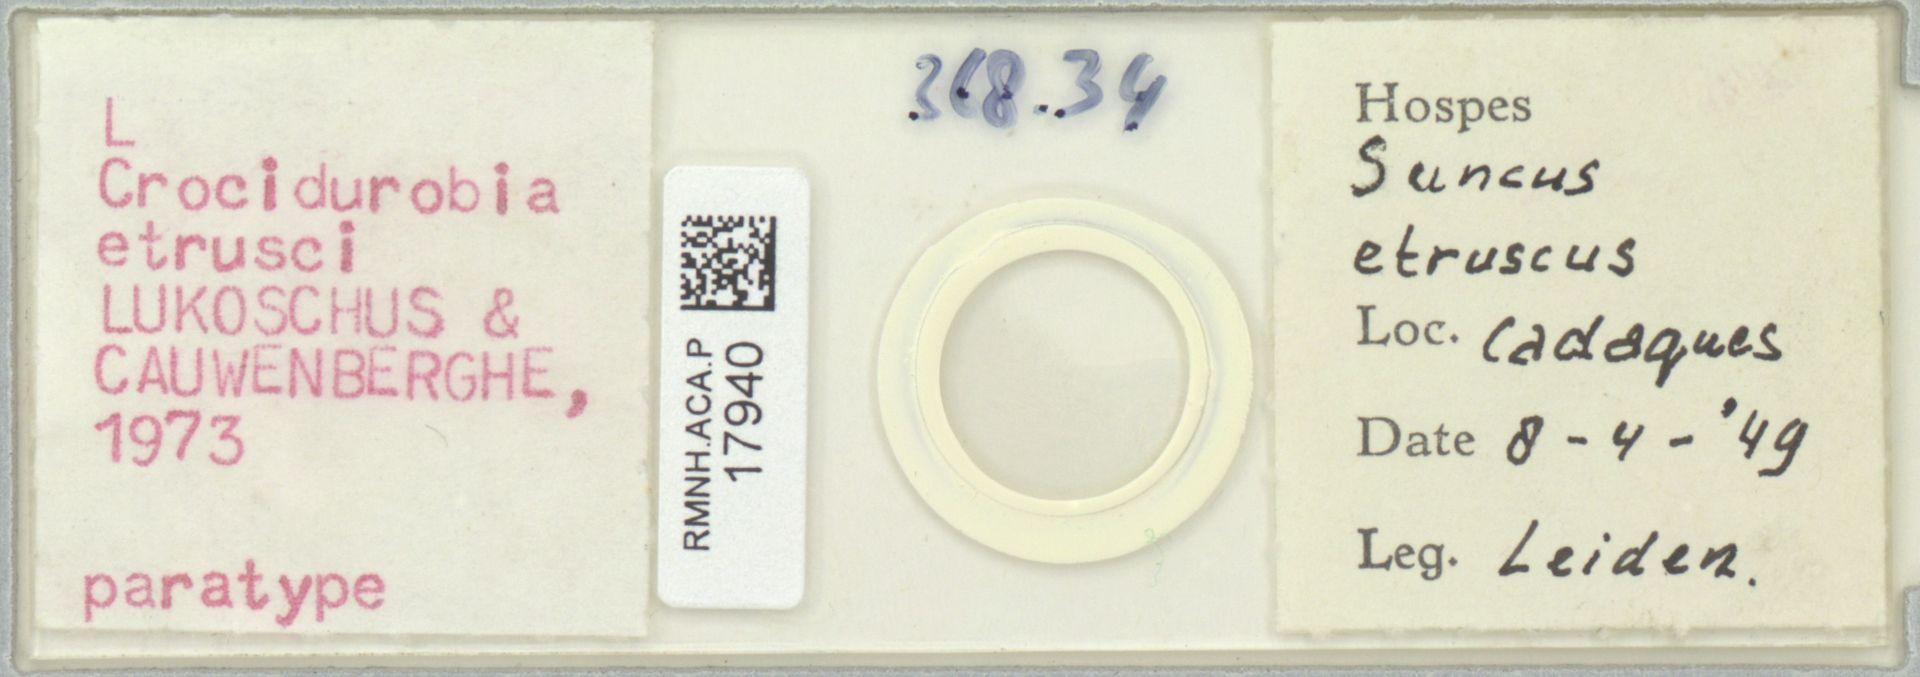 RMNH.ACA.P.17940 | Crocidurobia etrusci Lukoschus & Cauwenberghe, 1973